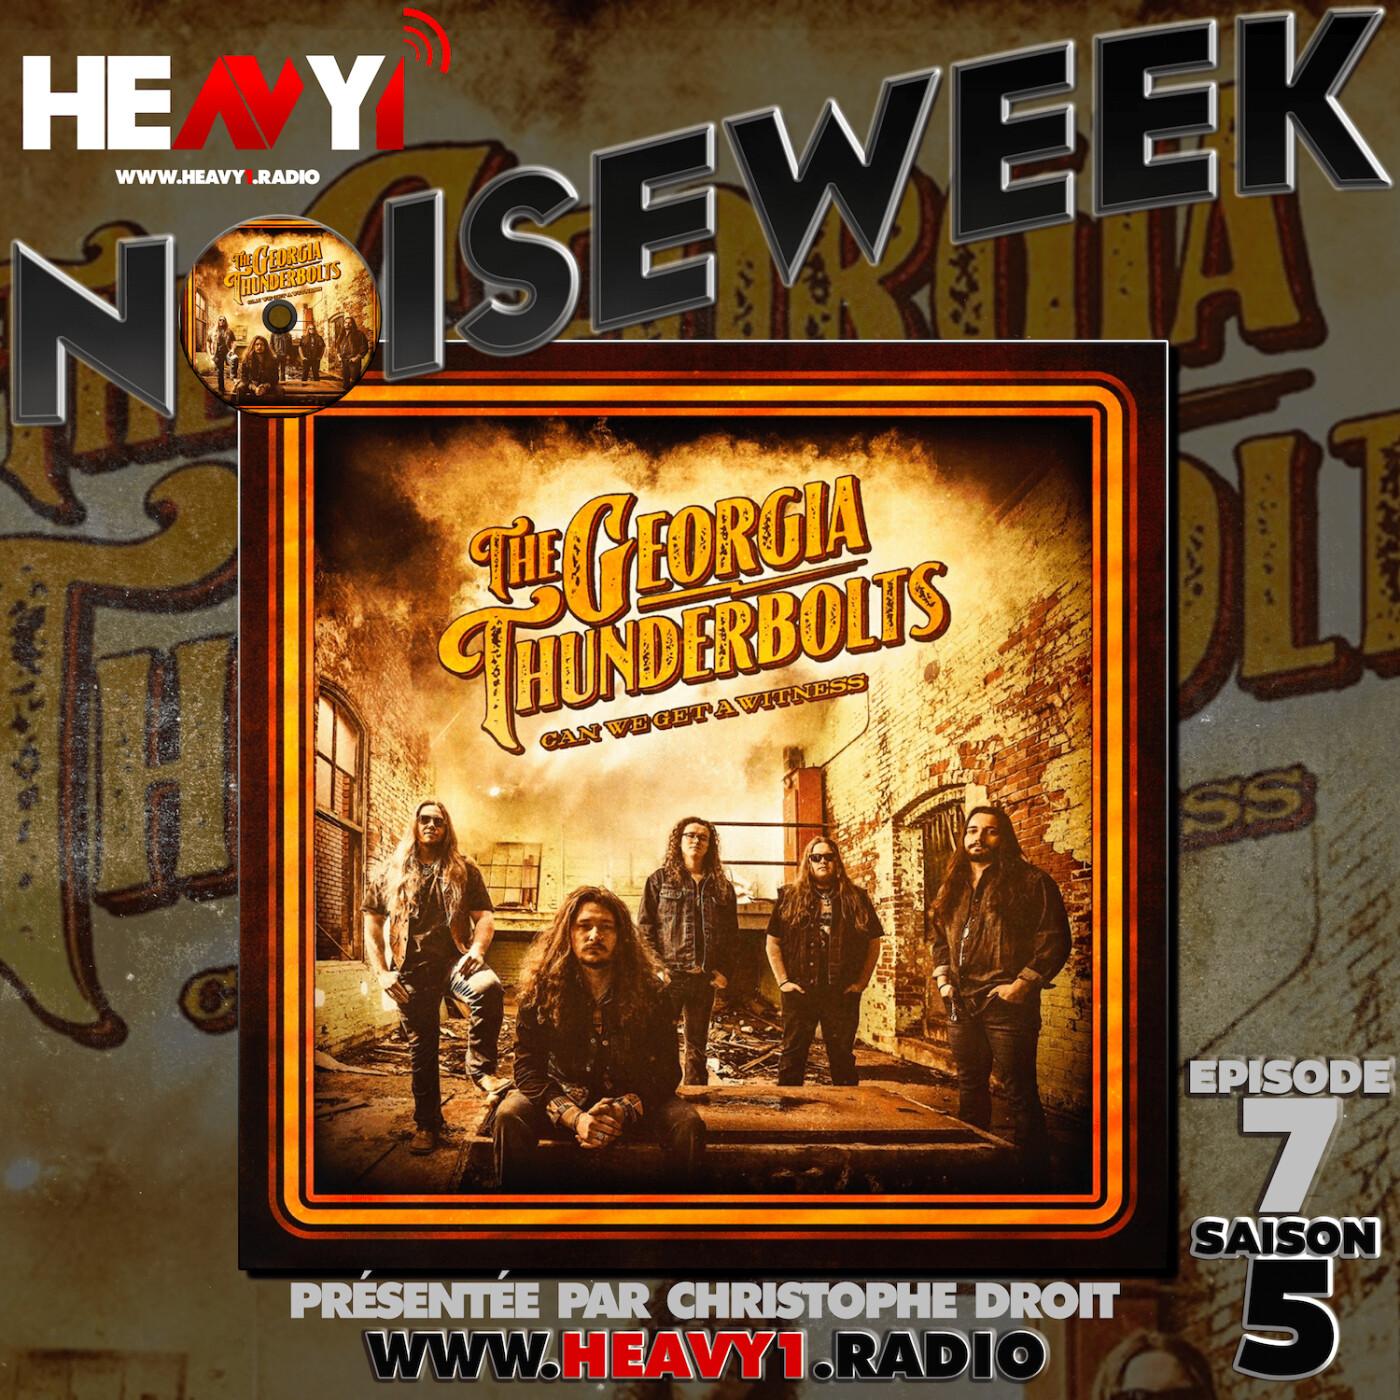 Noiseweek #7 Saison 5